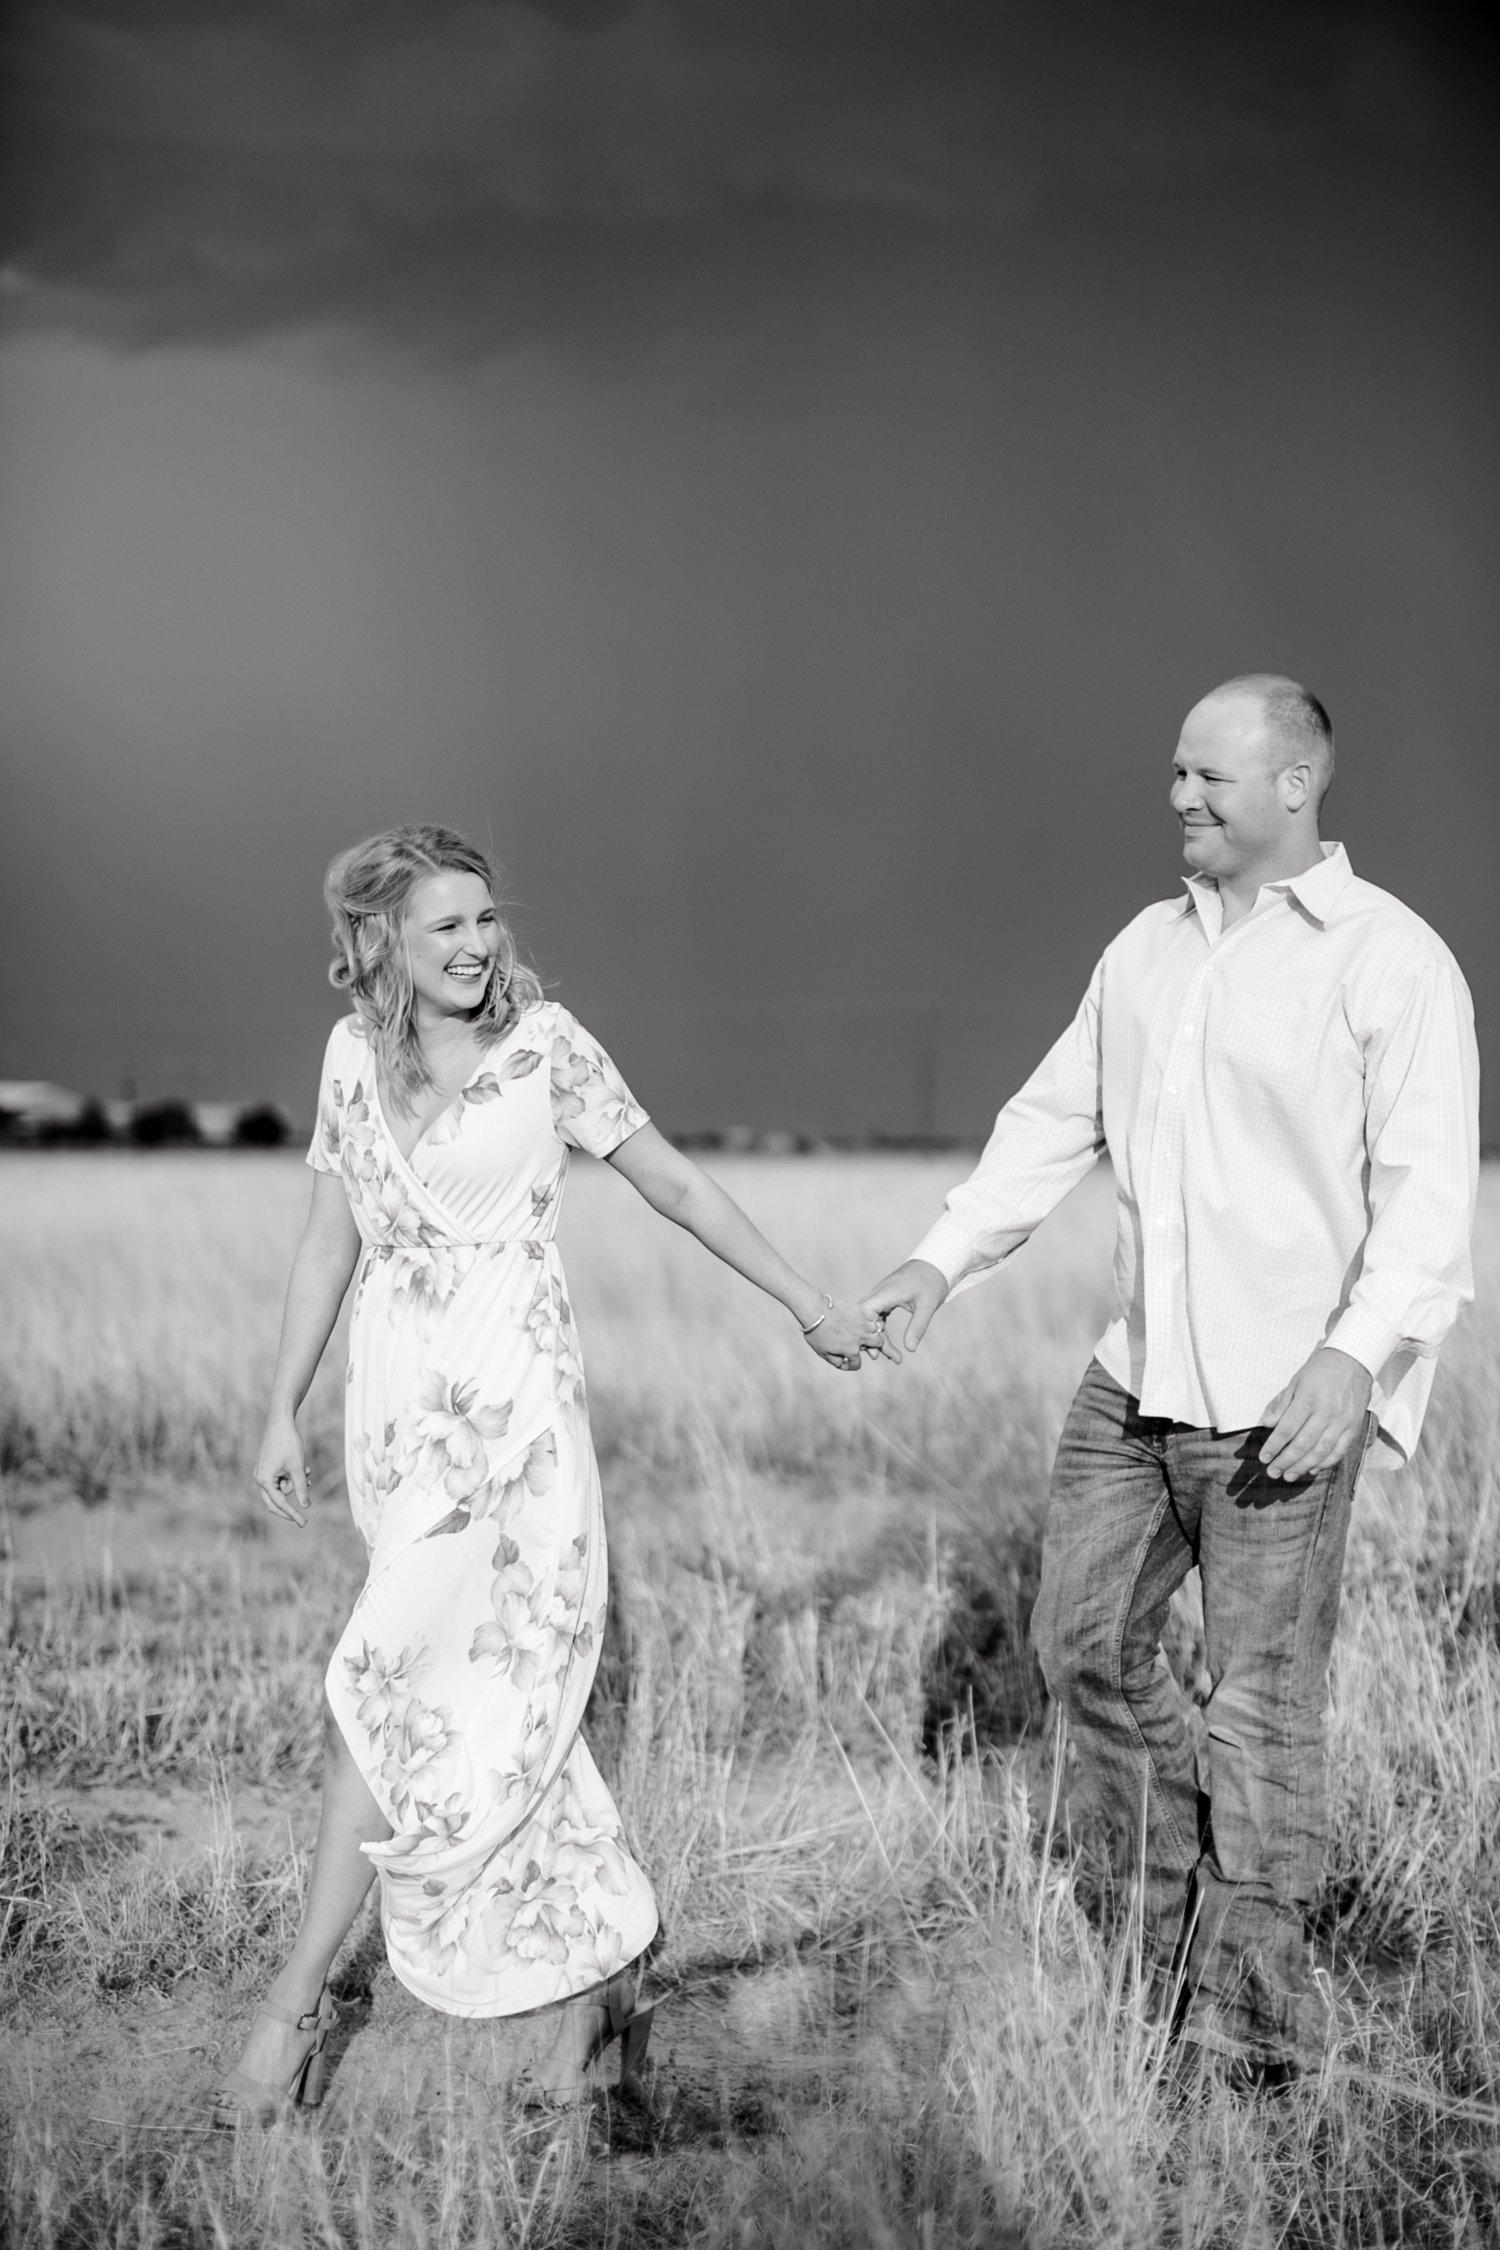 Morgan_and_Chris_Hebert_ALLEEJ_Engagement_Photographer_Lubbock_0023.jpg